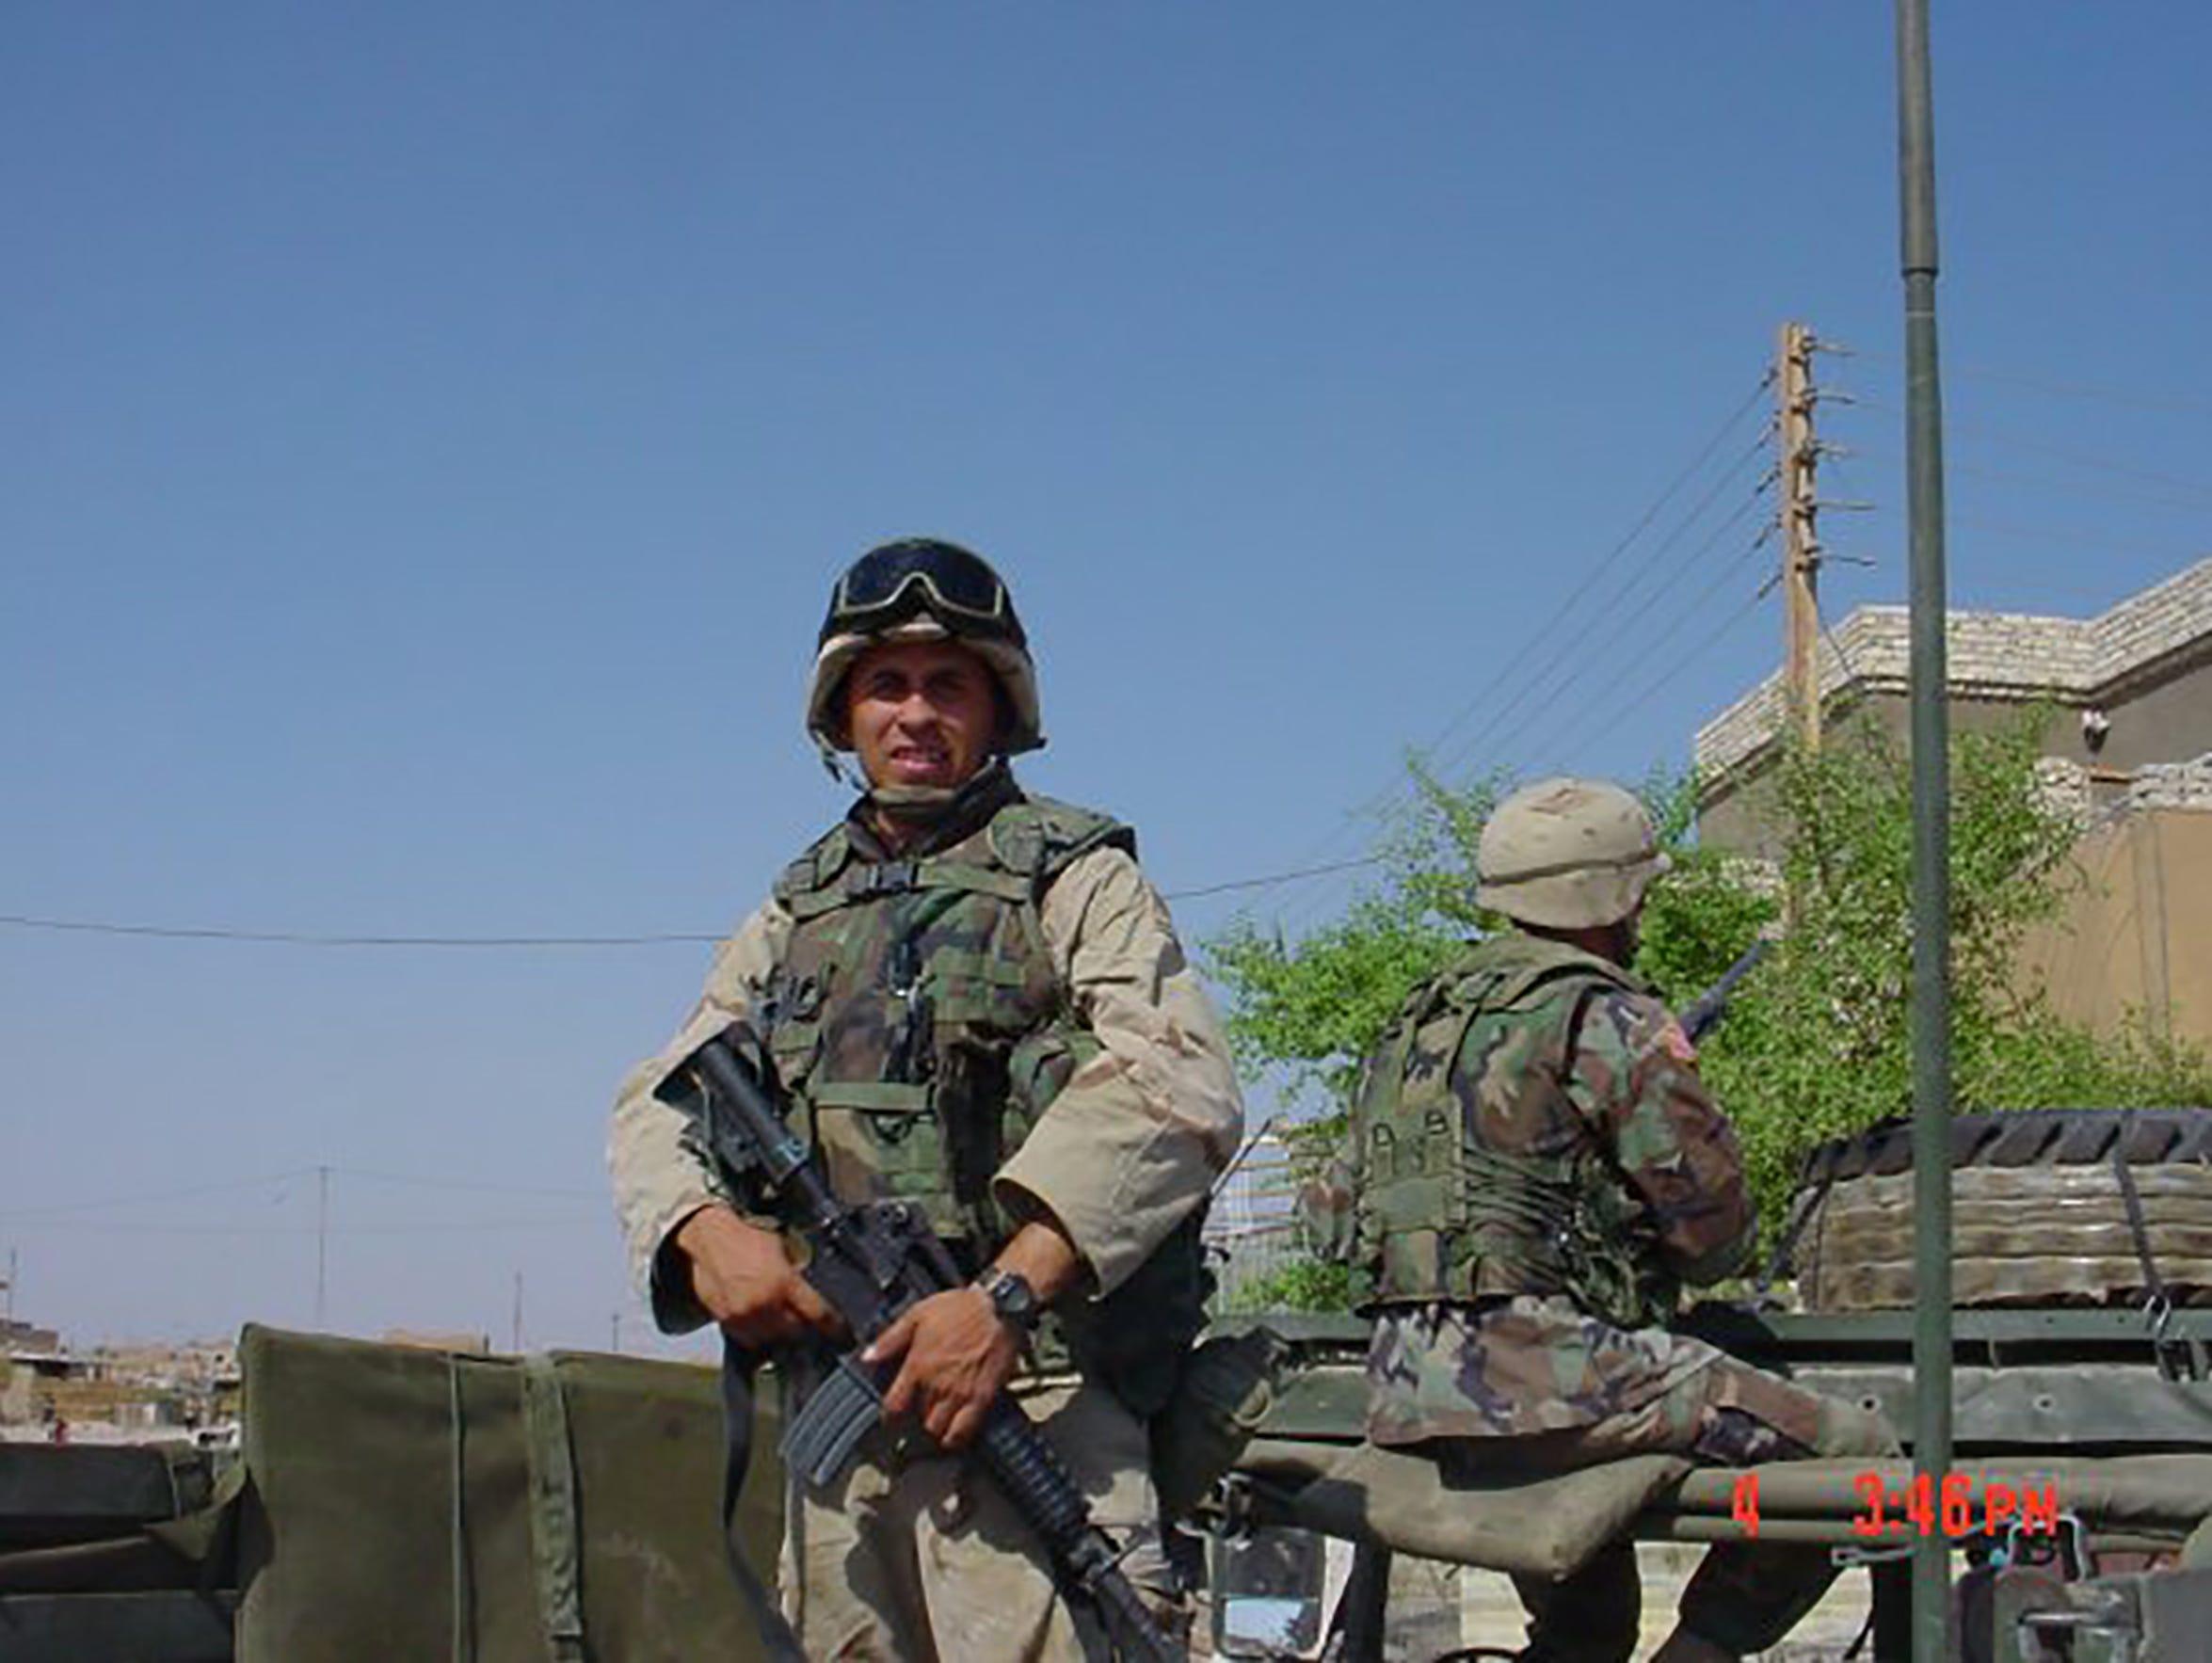 Jeff Bohn served as an Army medic in the Iraq War.